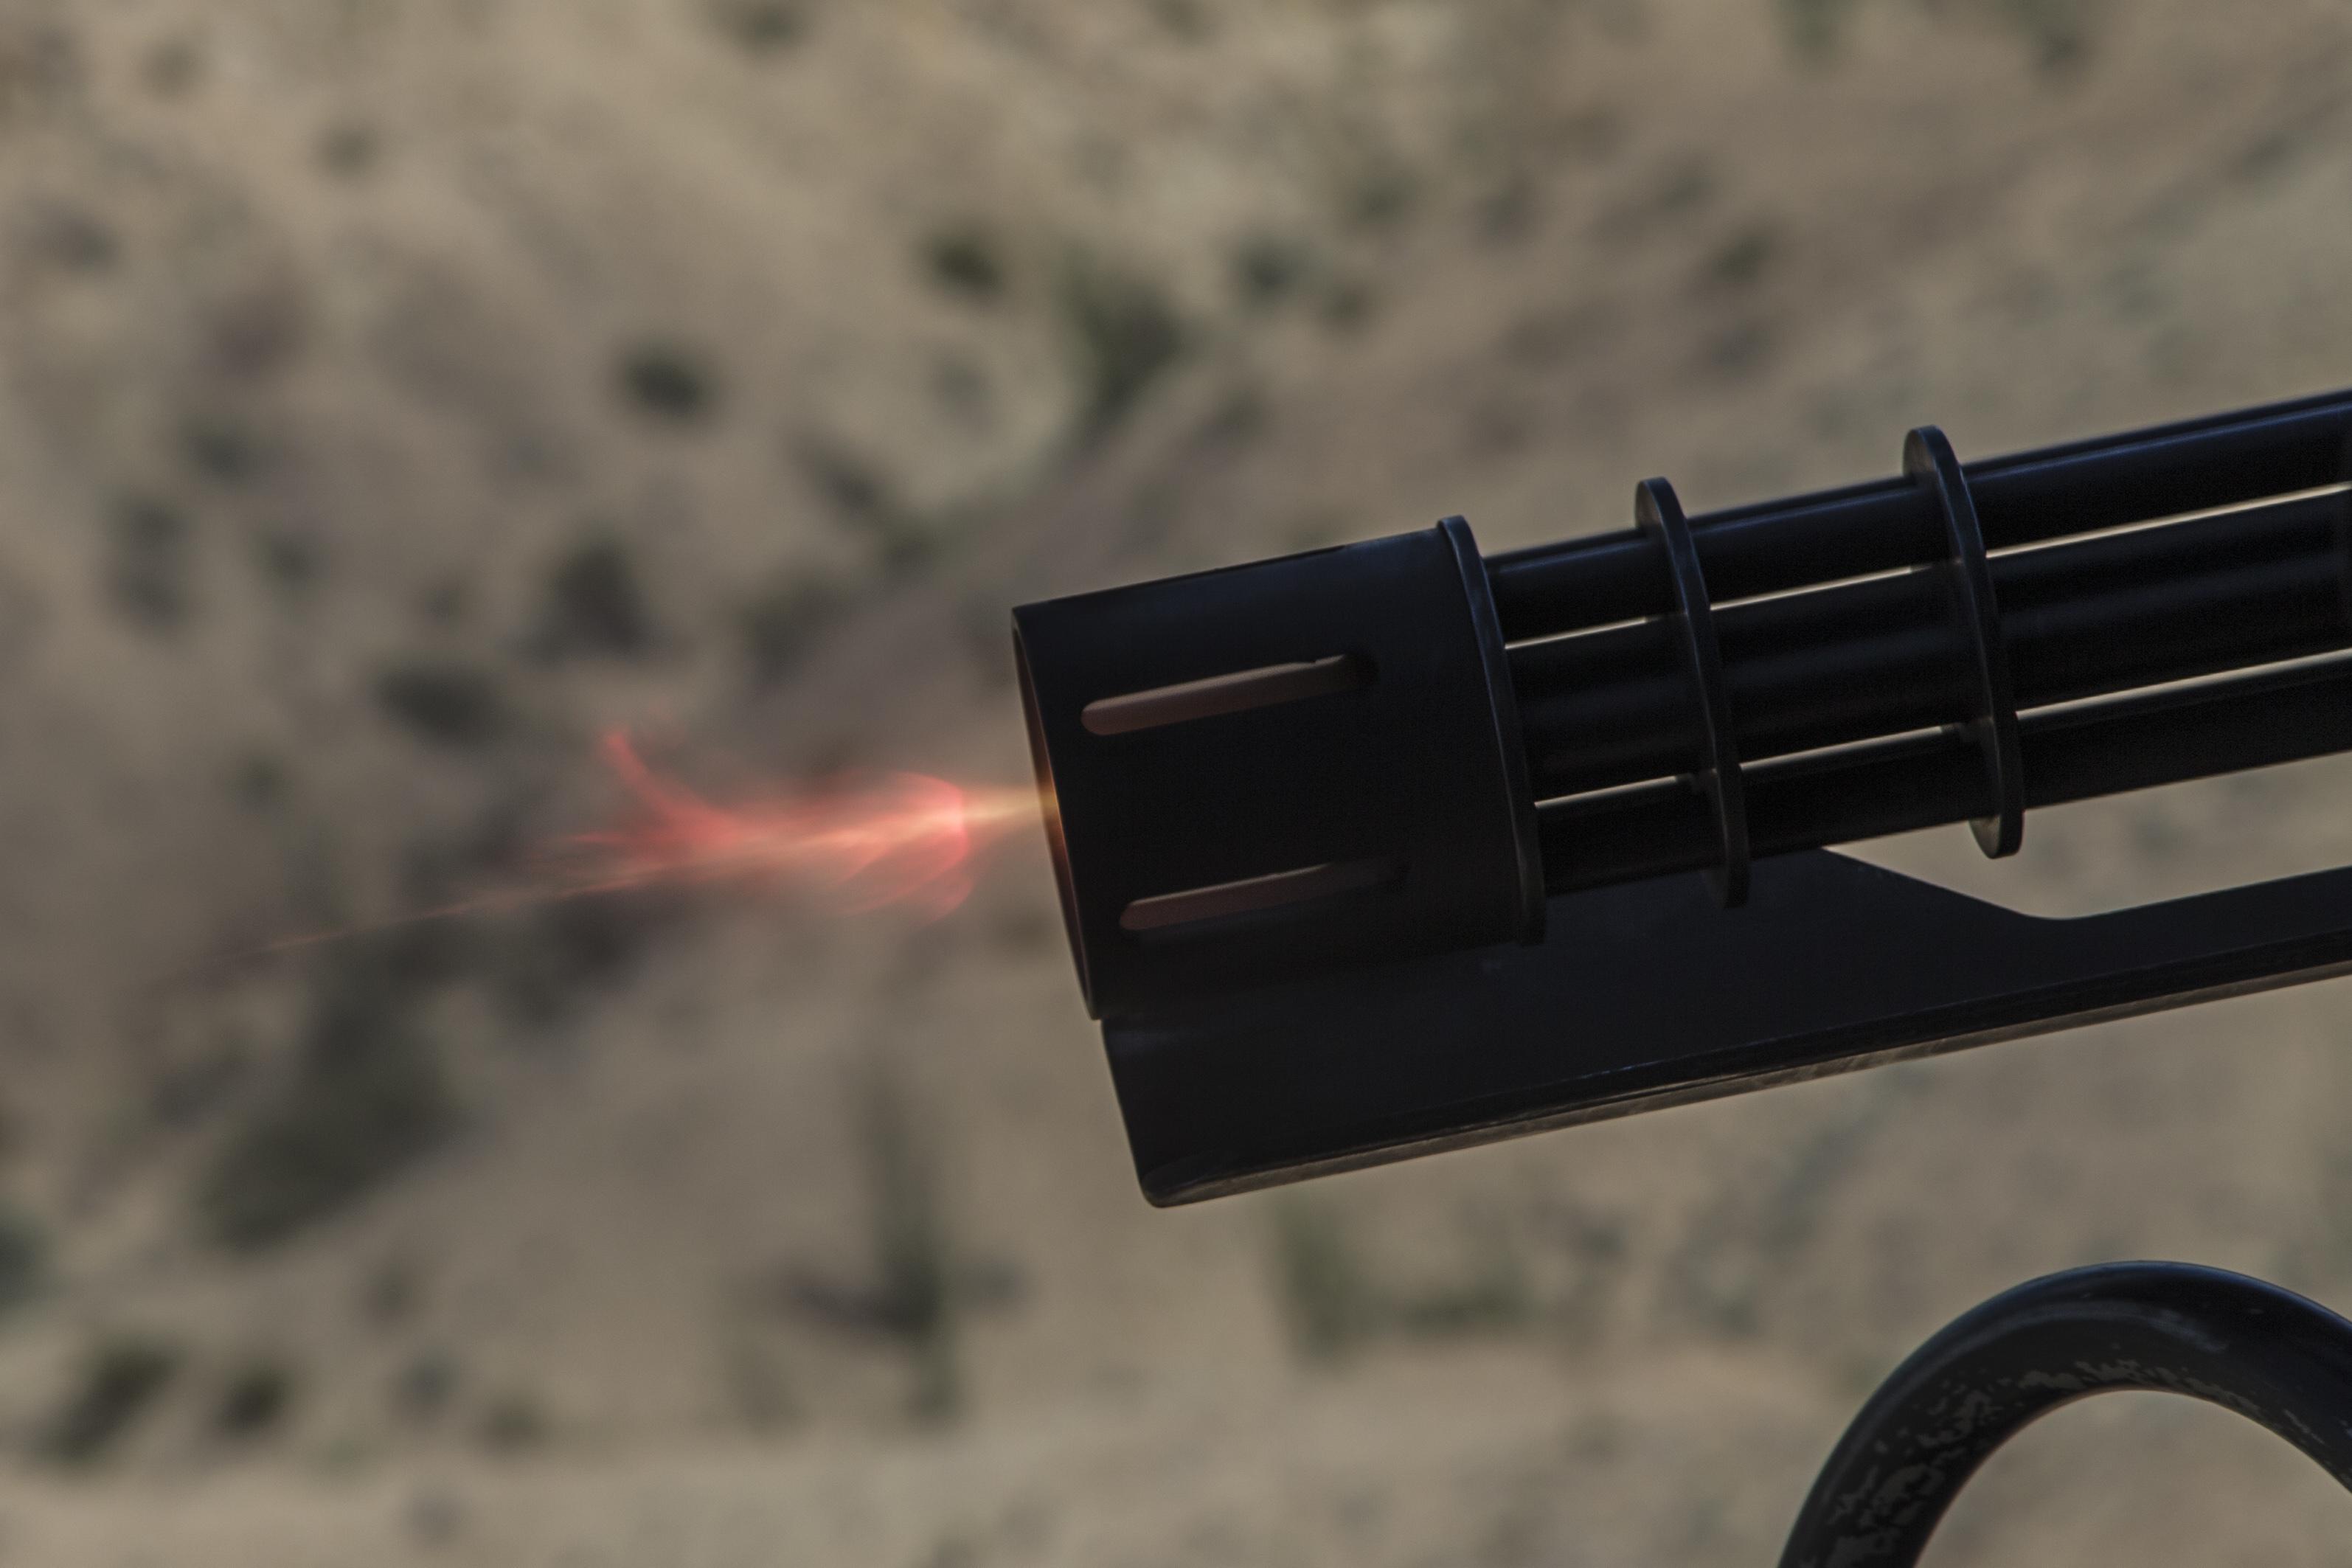 Gun Automatic Unit, Automatic, Firepower, Gun, Machine, HQ Photo